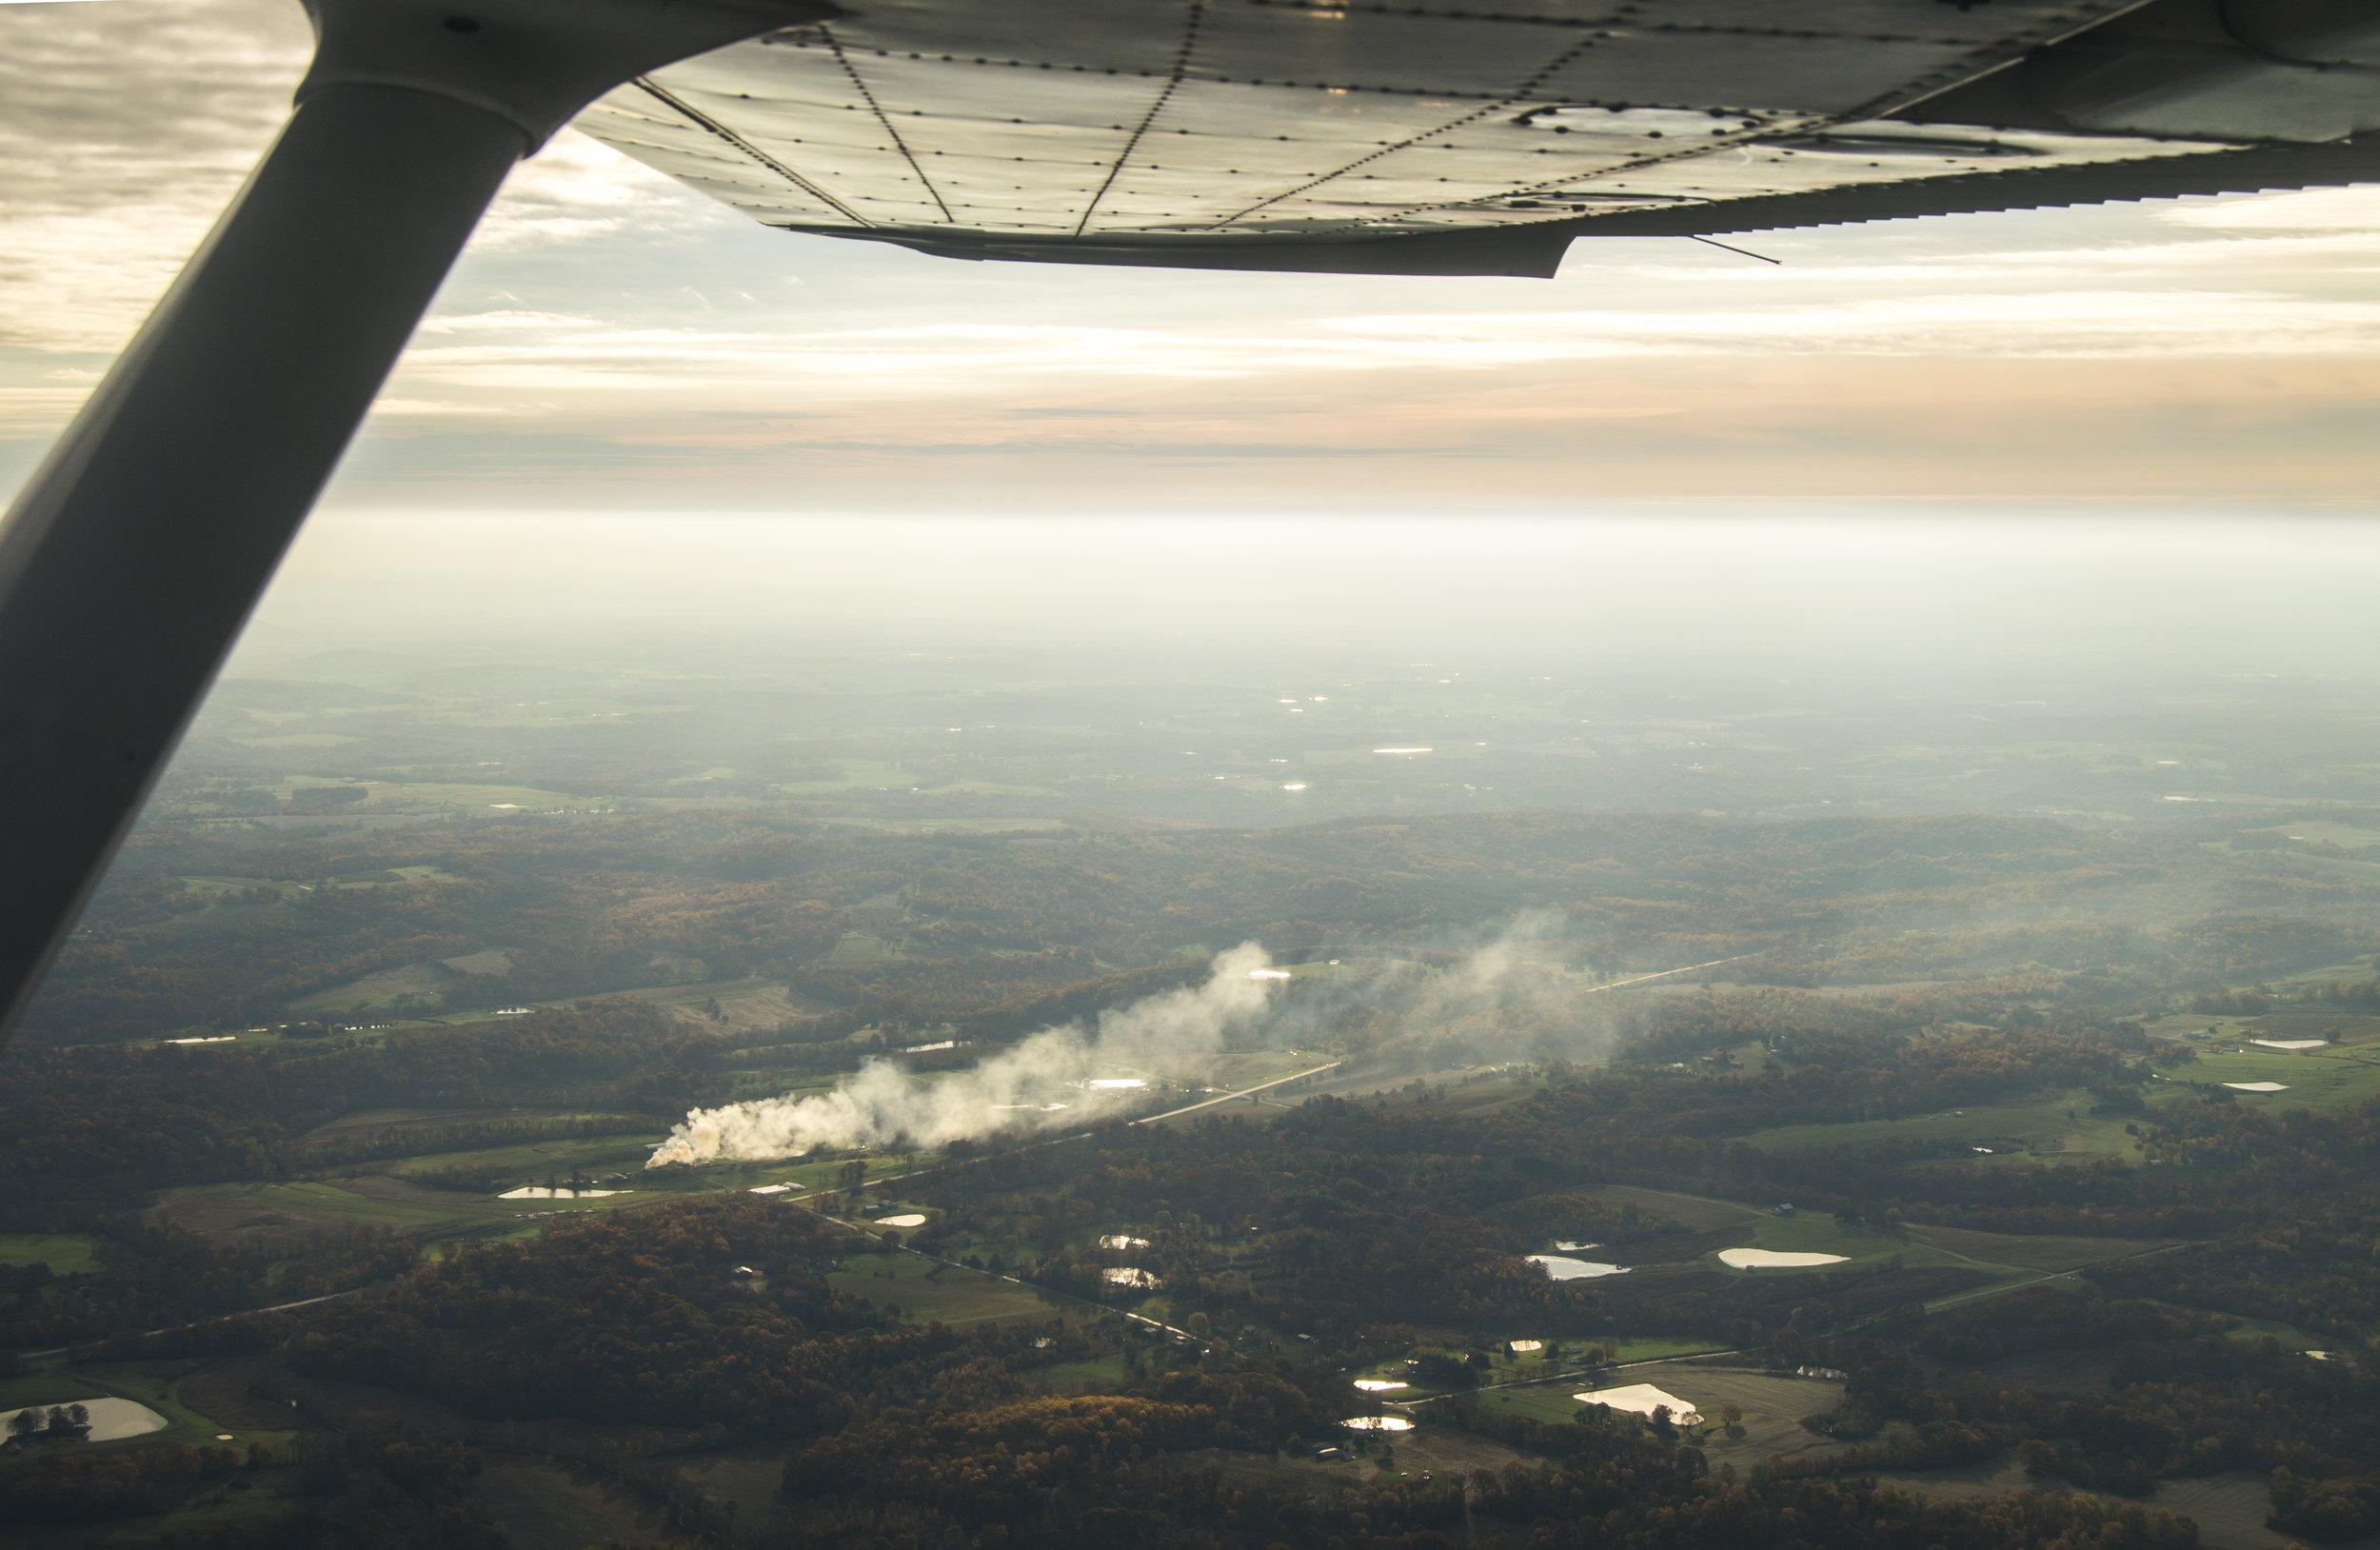 [Aviation] Fire Burning